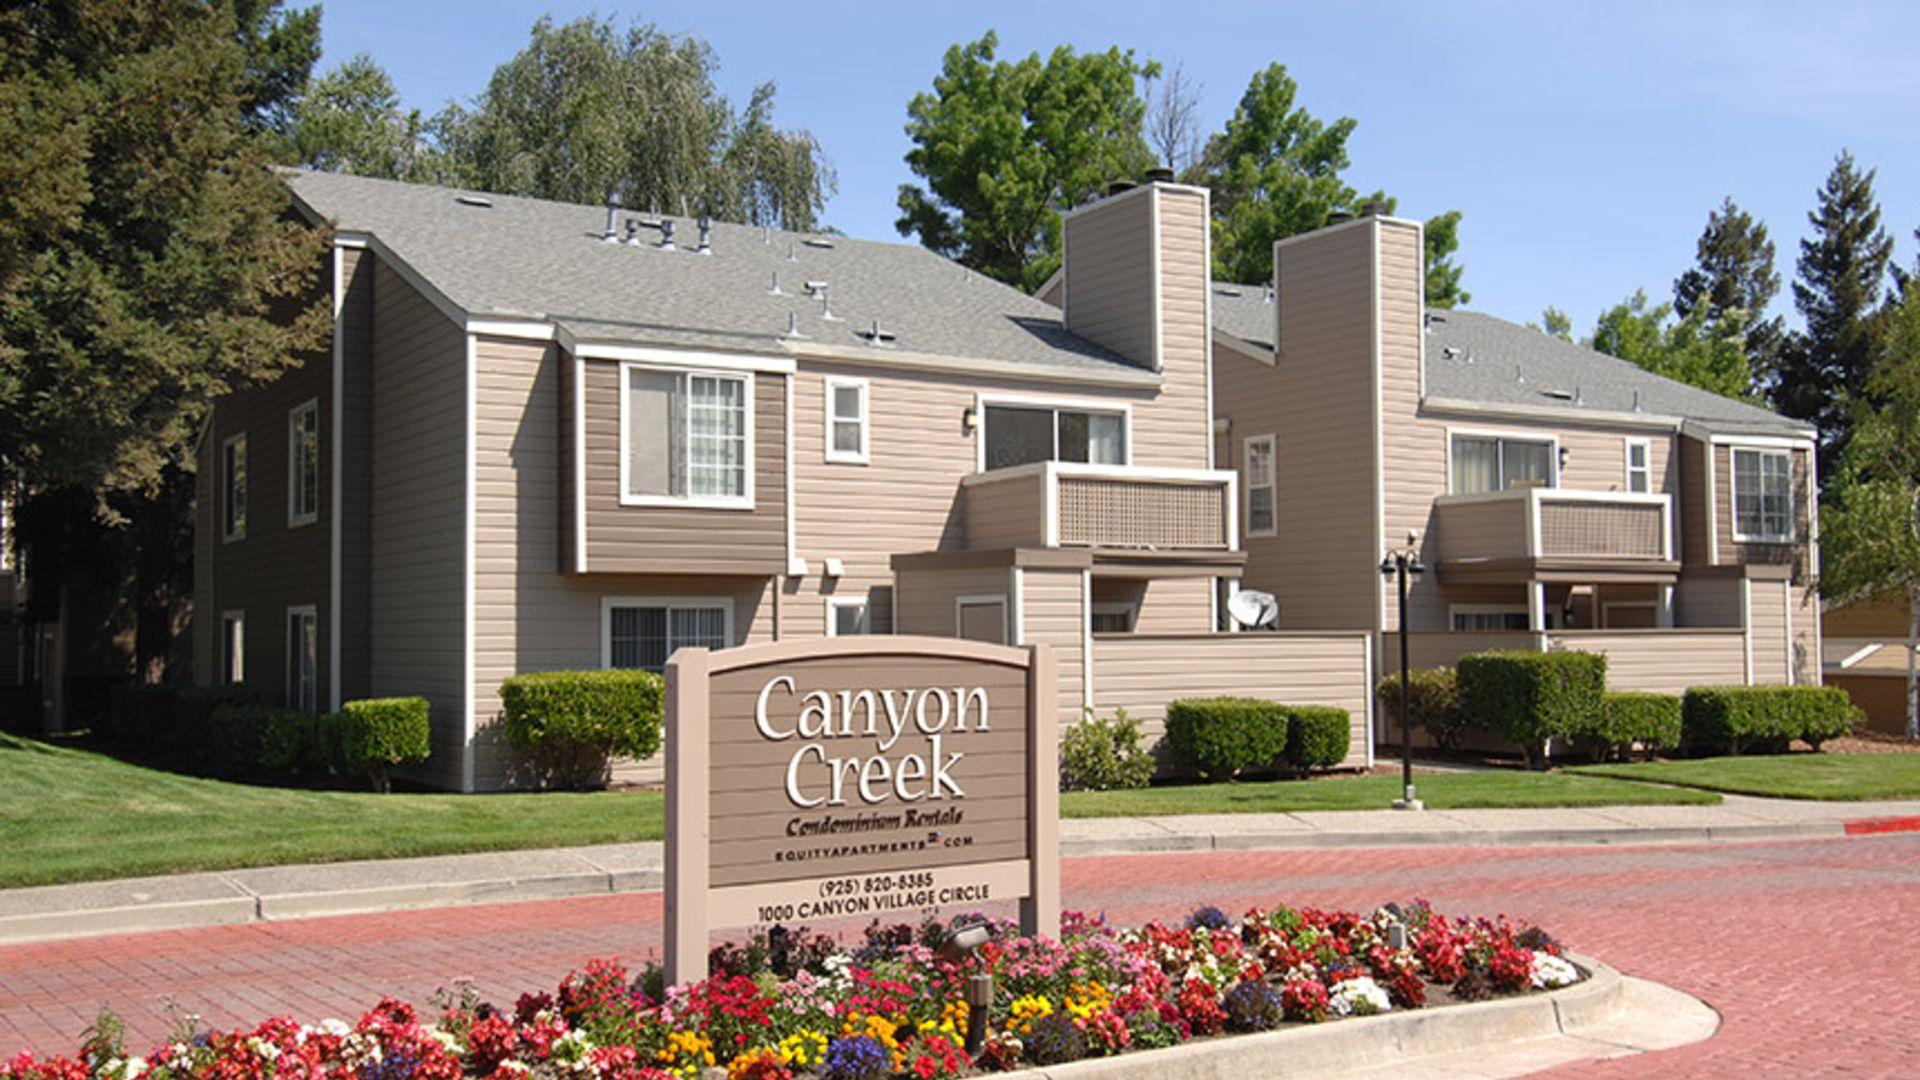 Canyon Creek Apartments Exterior